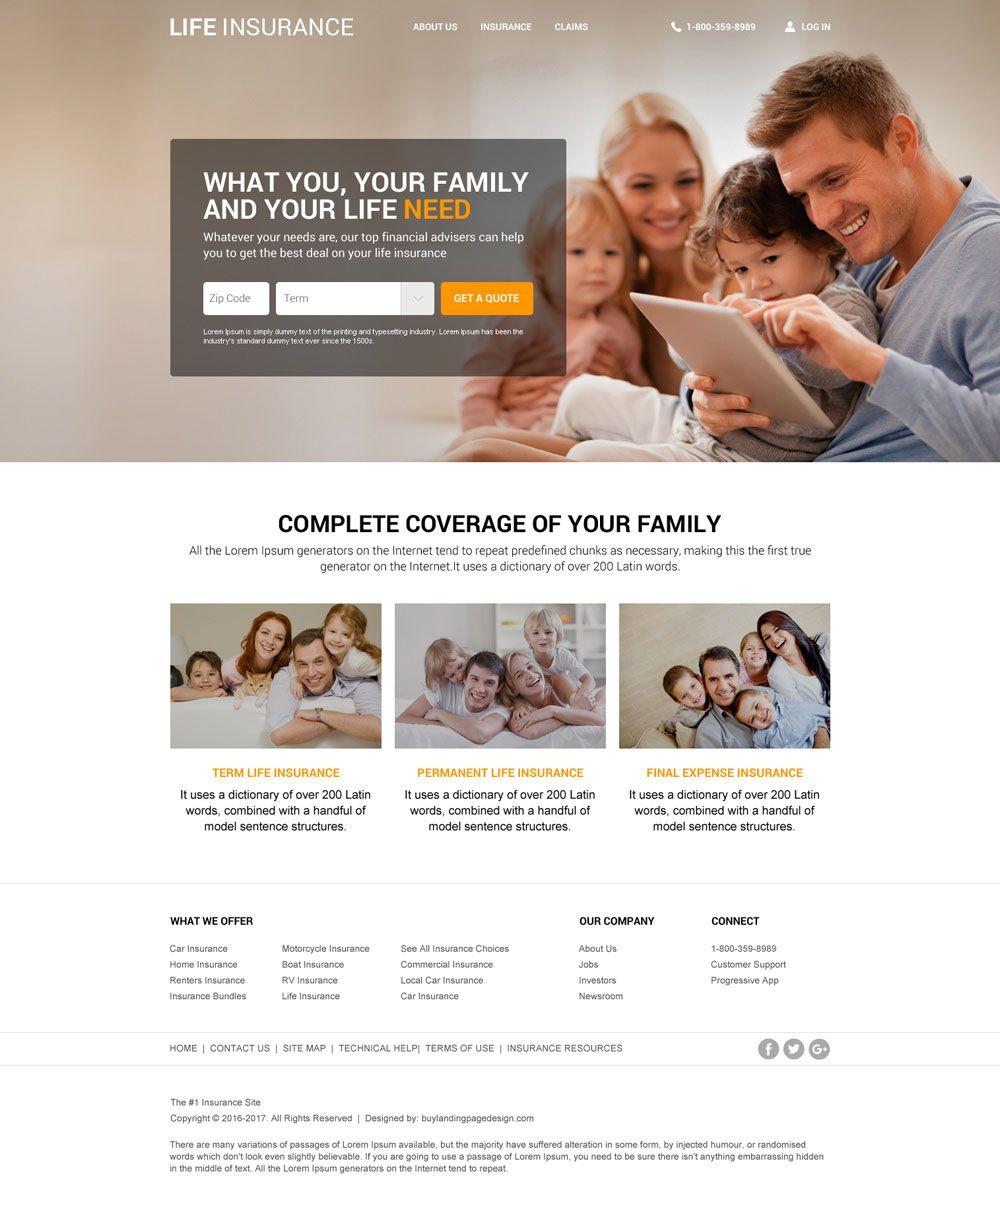 Insurance Web Design Services